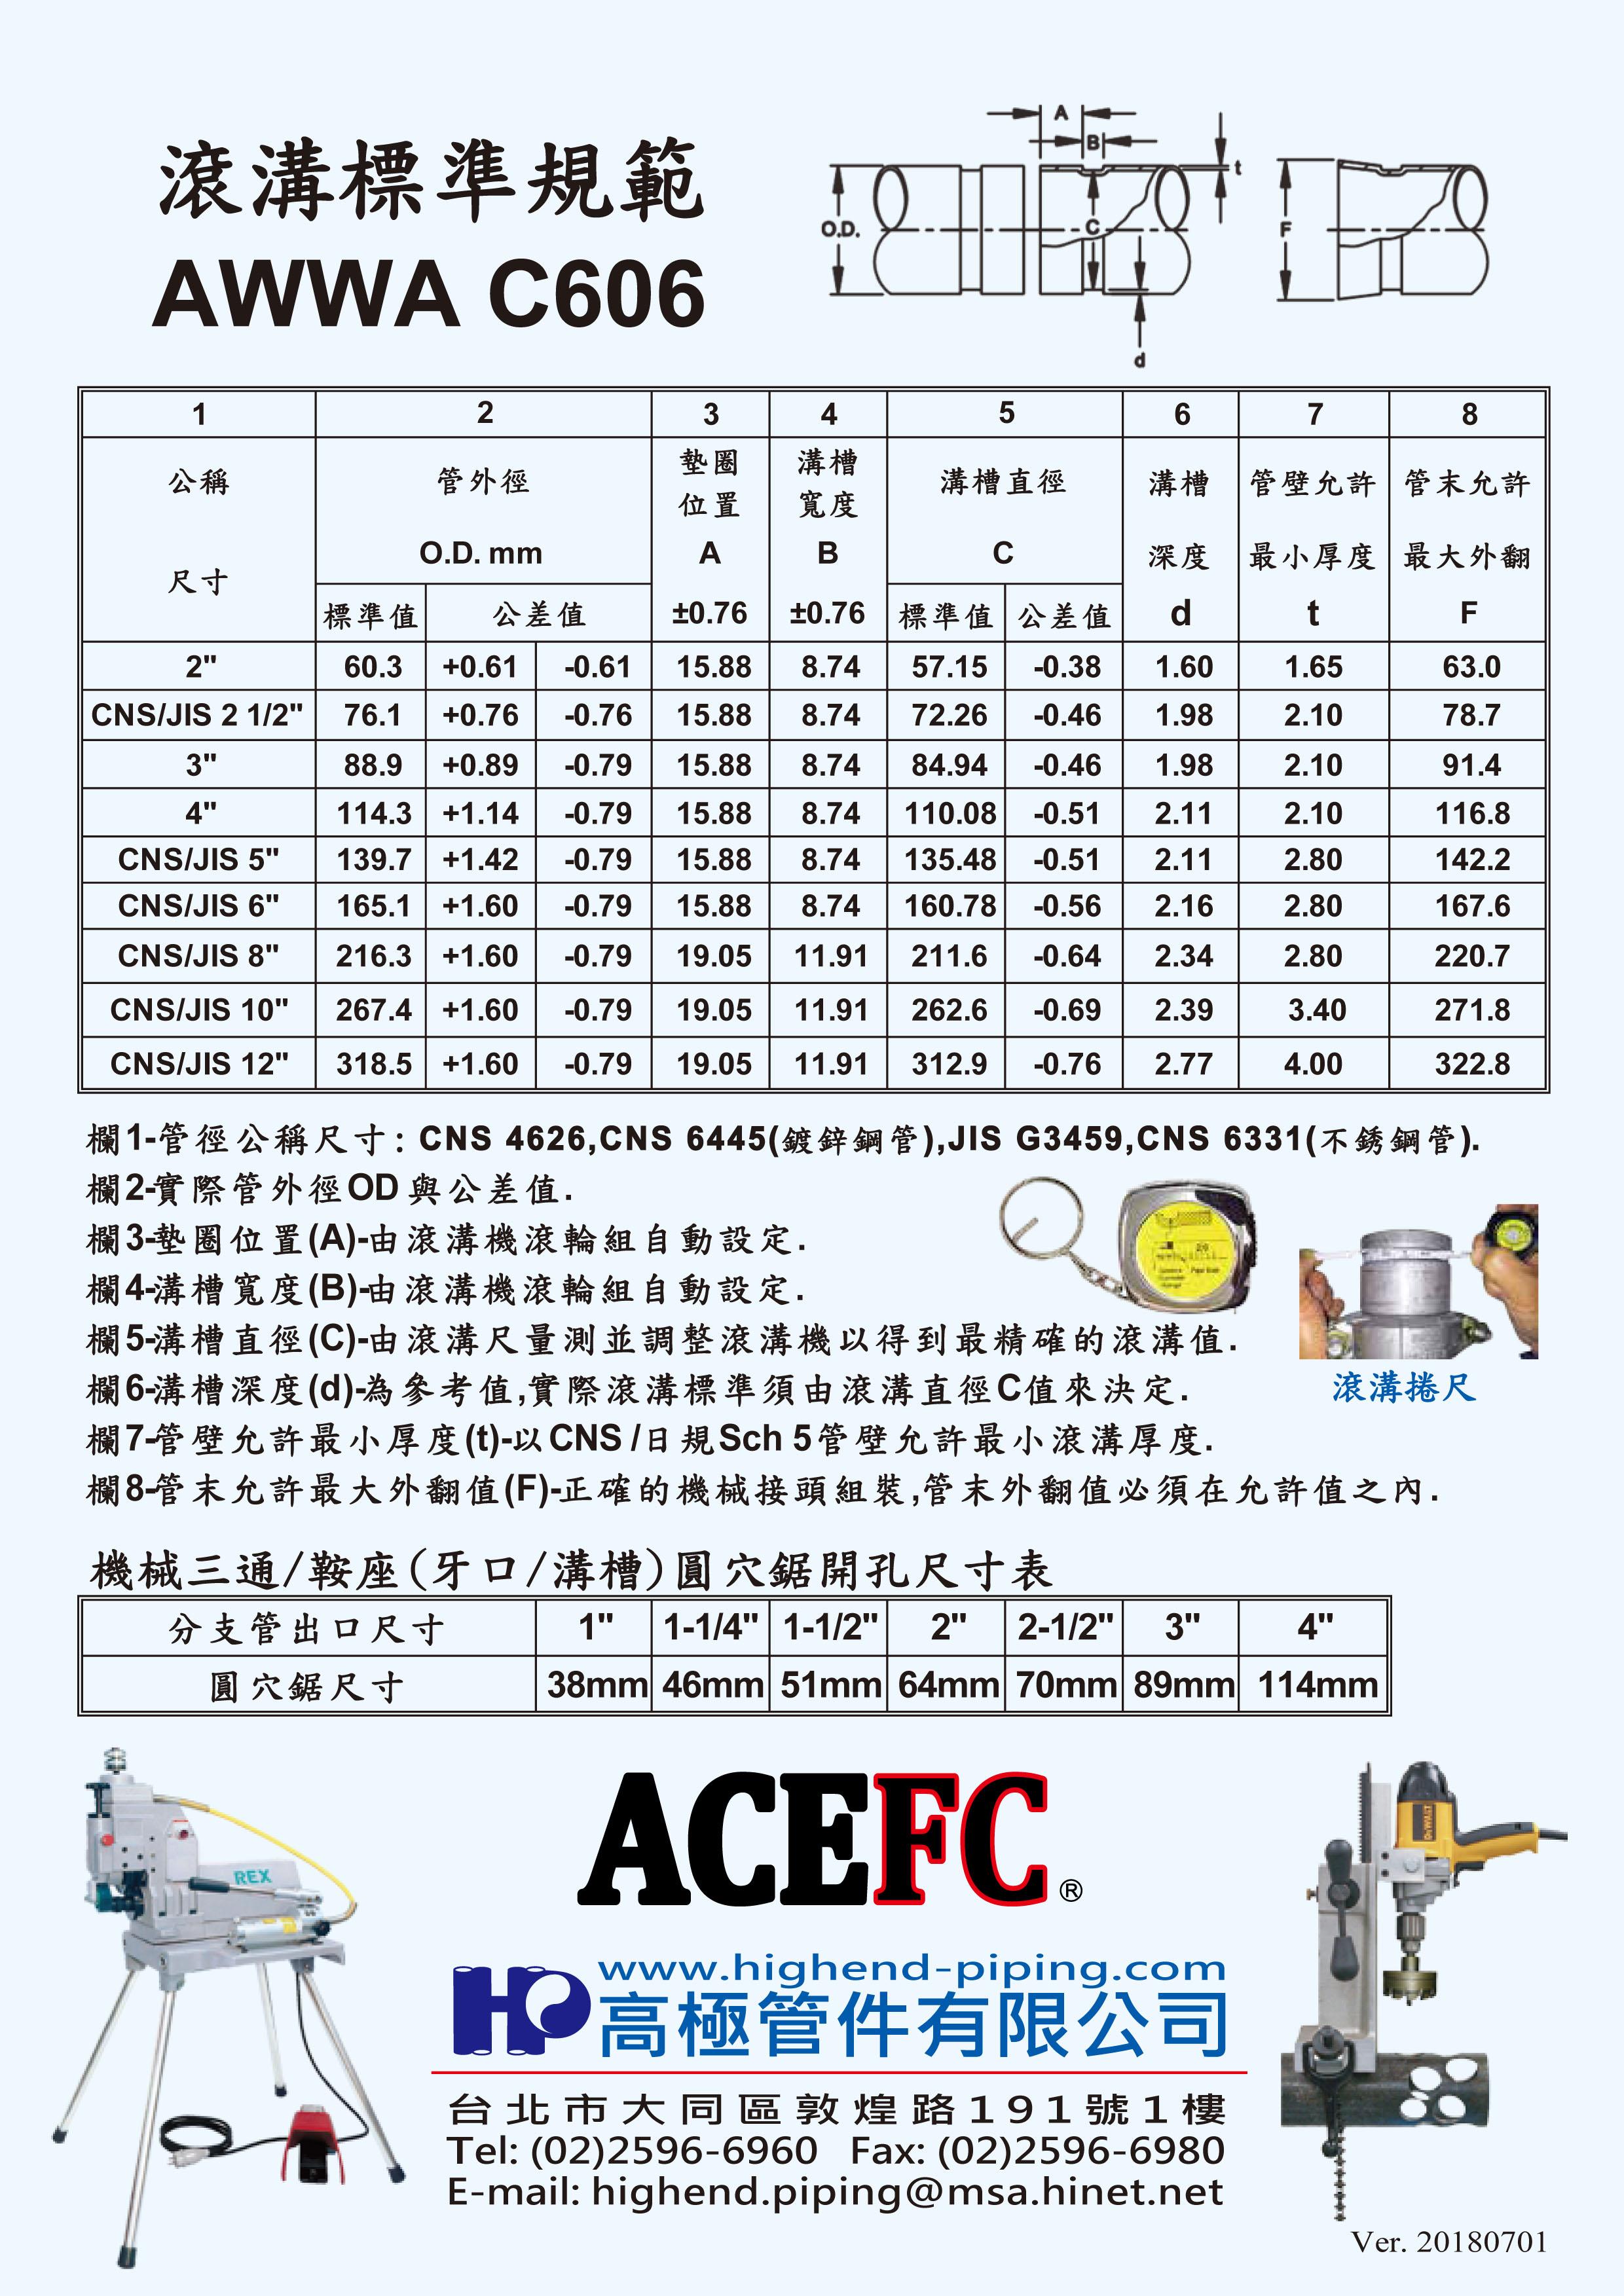 ACEFC王牌溝槽式機械接頭-高極管件-12.jpg